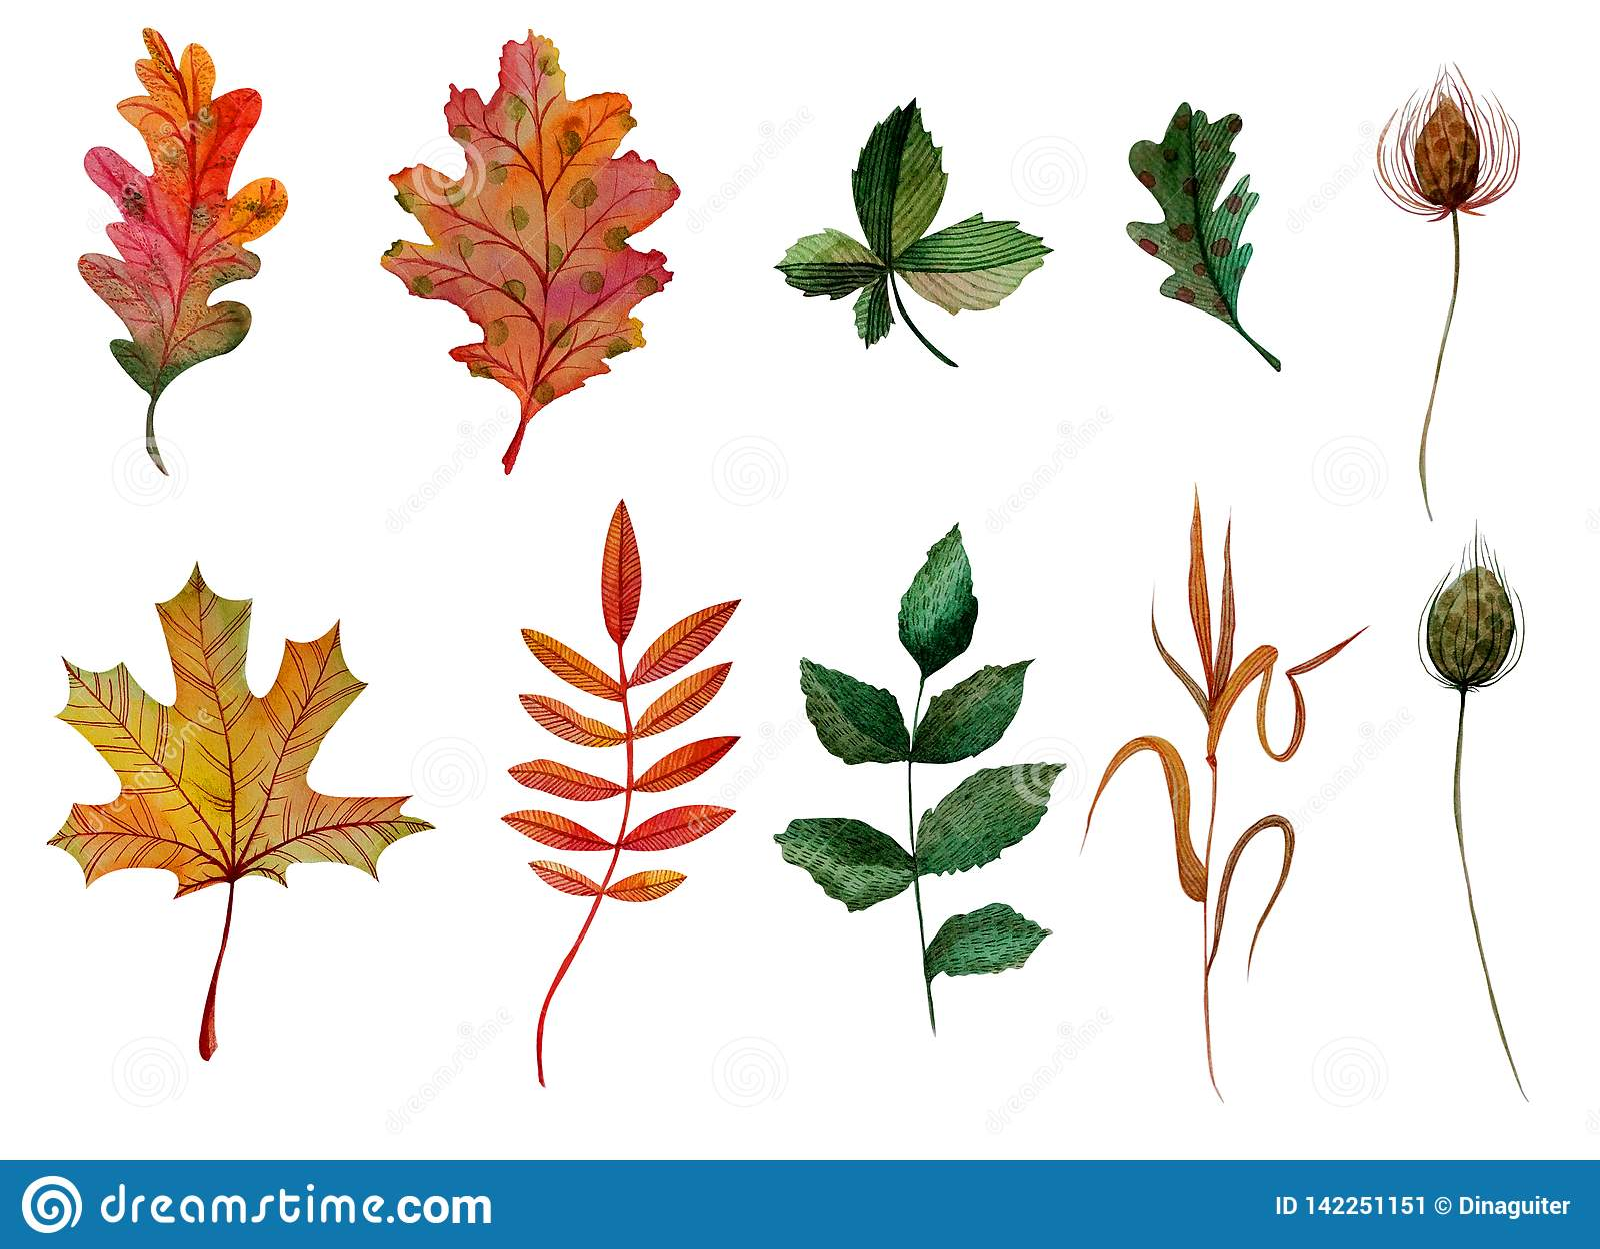 Bur травинки каштана плода шиповника клена дуба листьев осени набора элементов акварели ashberry